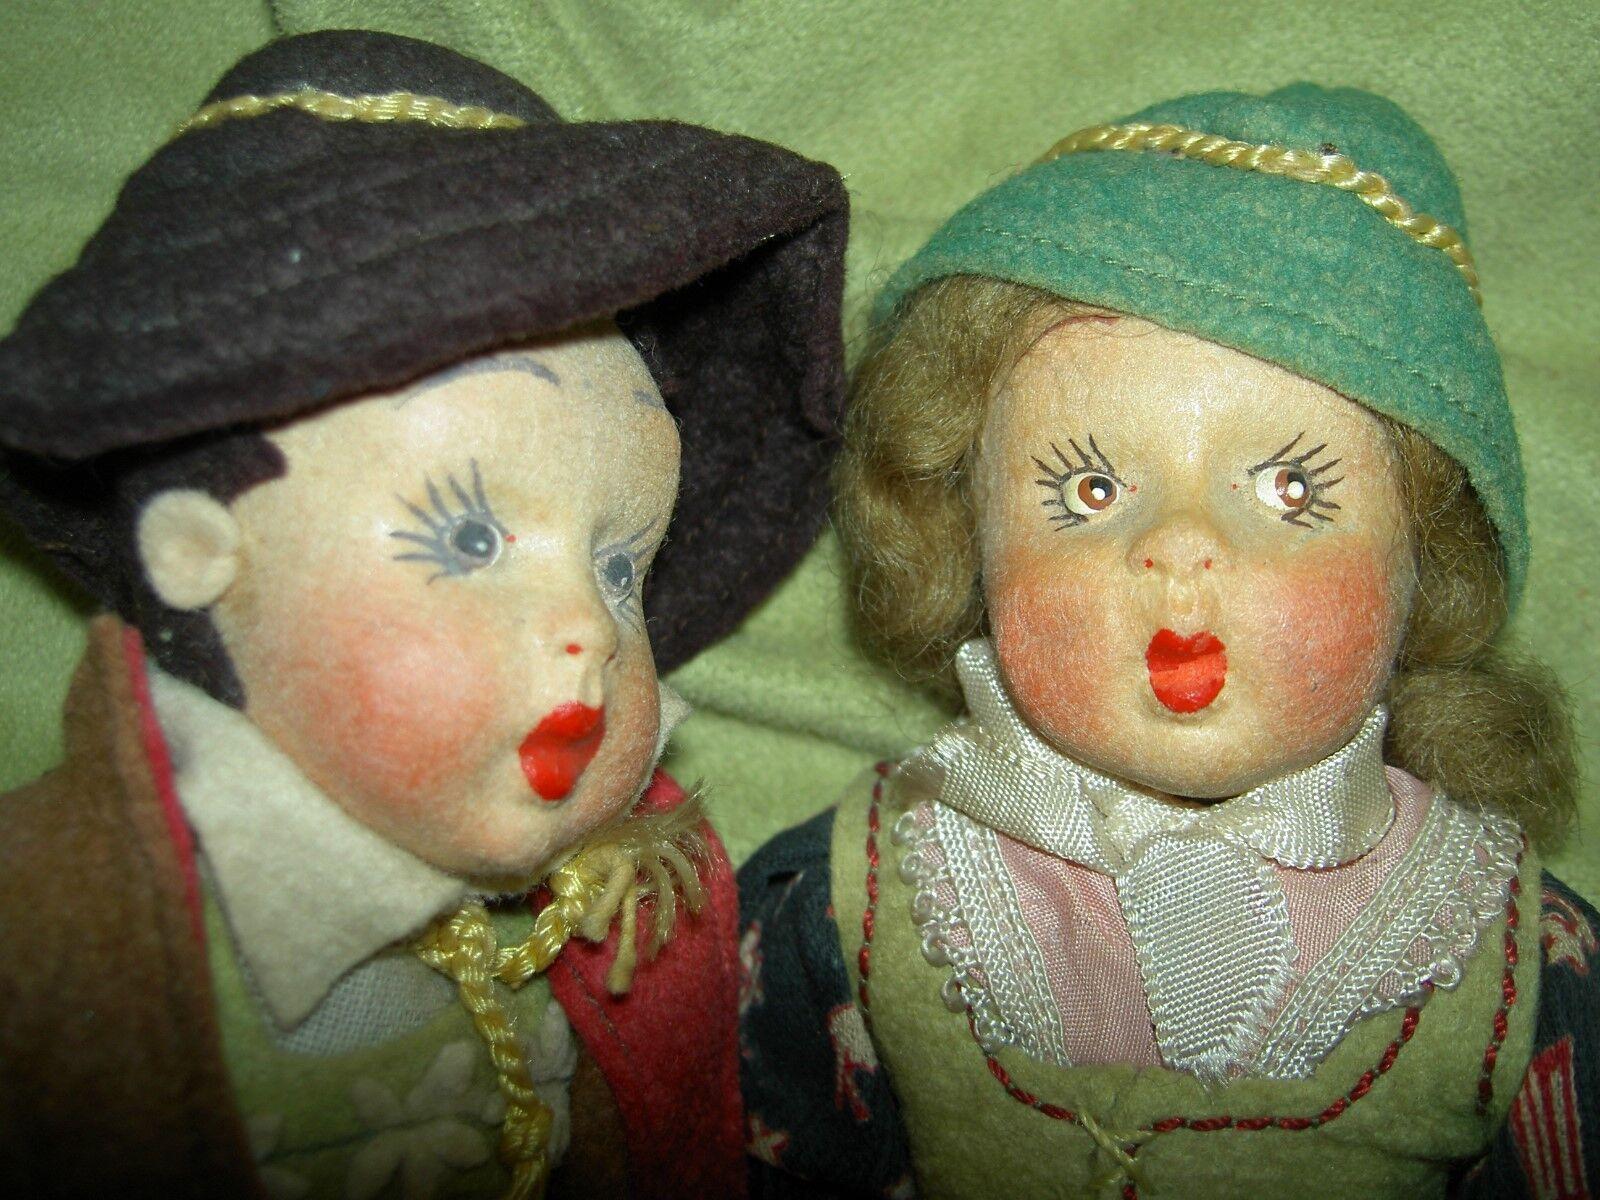 Pair  label felt  mascotte  miniature CARLA labeled (Lenci type) 1930 dolls